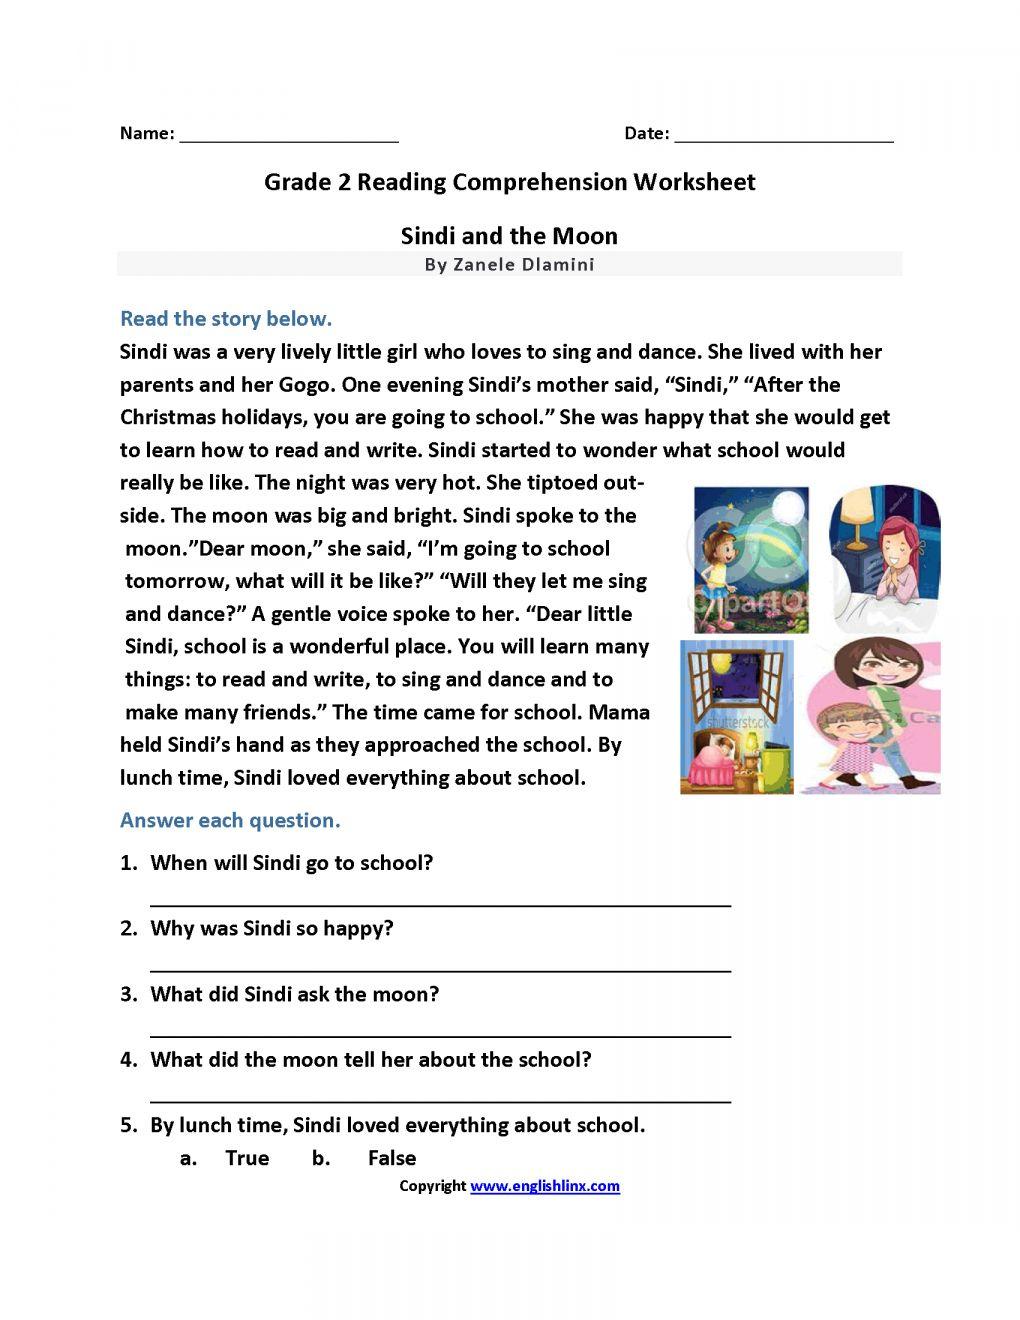 12 2Nd Grade Reading Worksheet Packets   2nd grade reading worksheets [ 1320 x 1020 Pixel ]